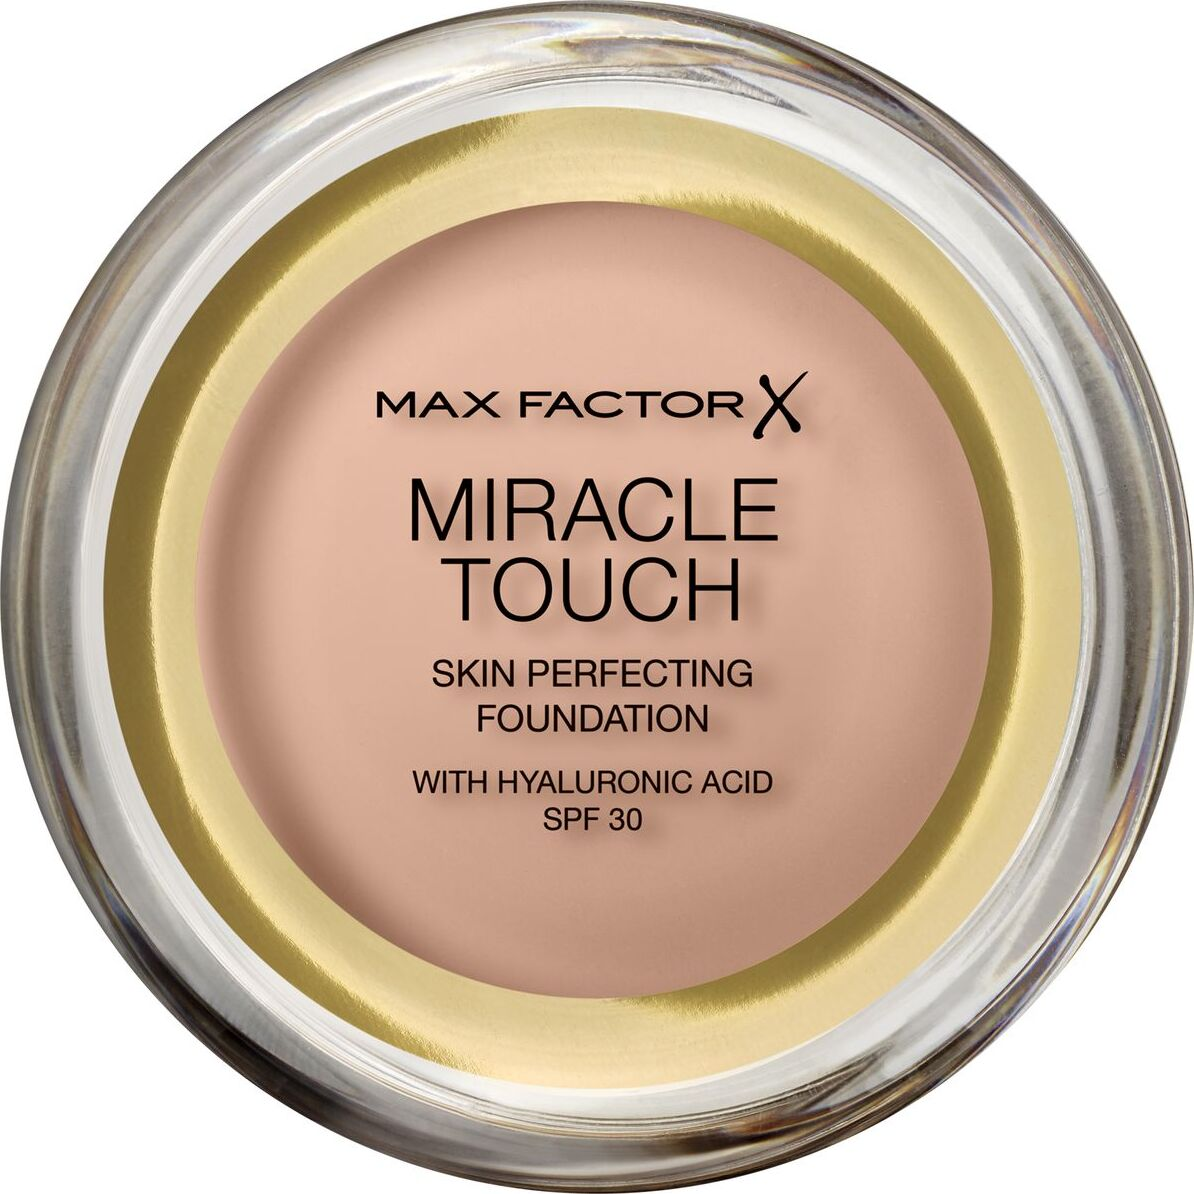 Тональная основа Max Factor Miracle Touch, SPF 30, тон 55 Blushing Beige, 11 мл